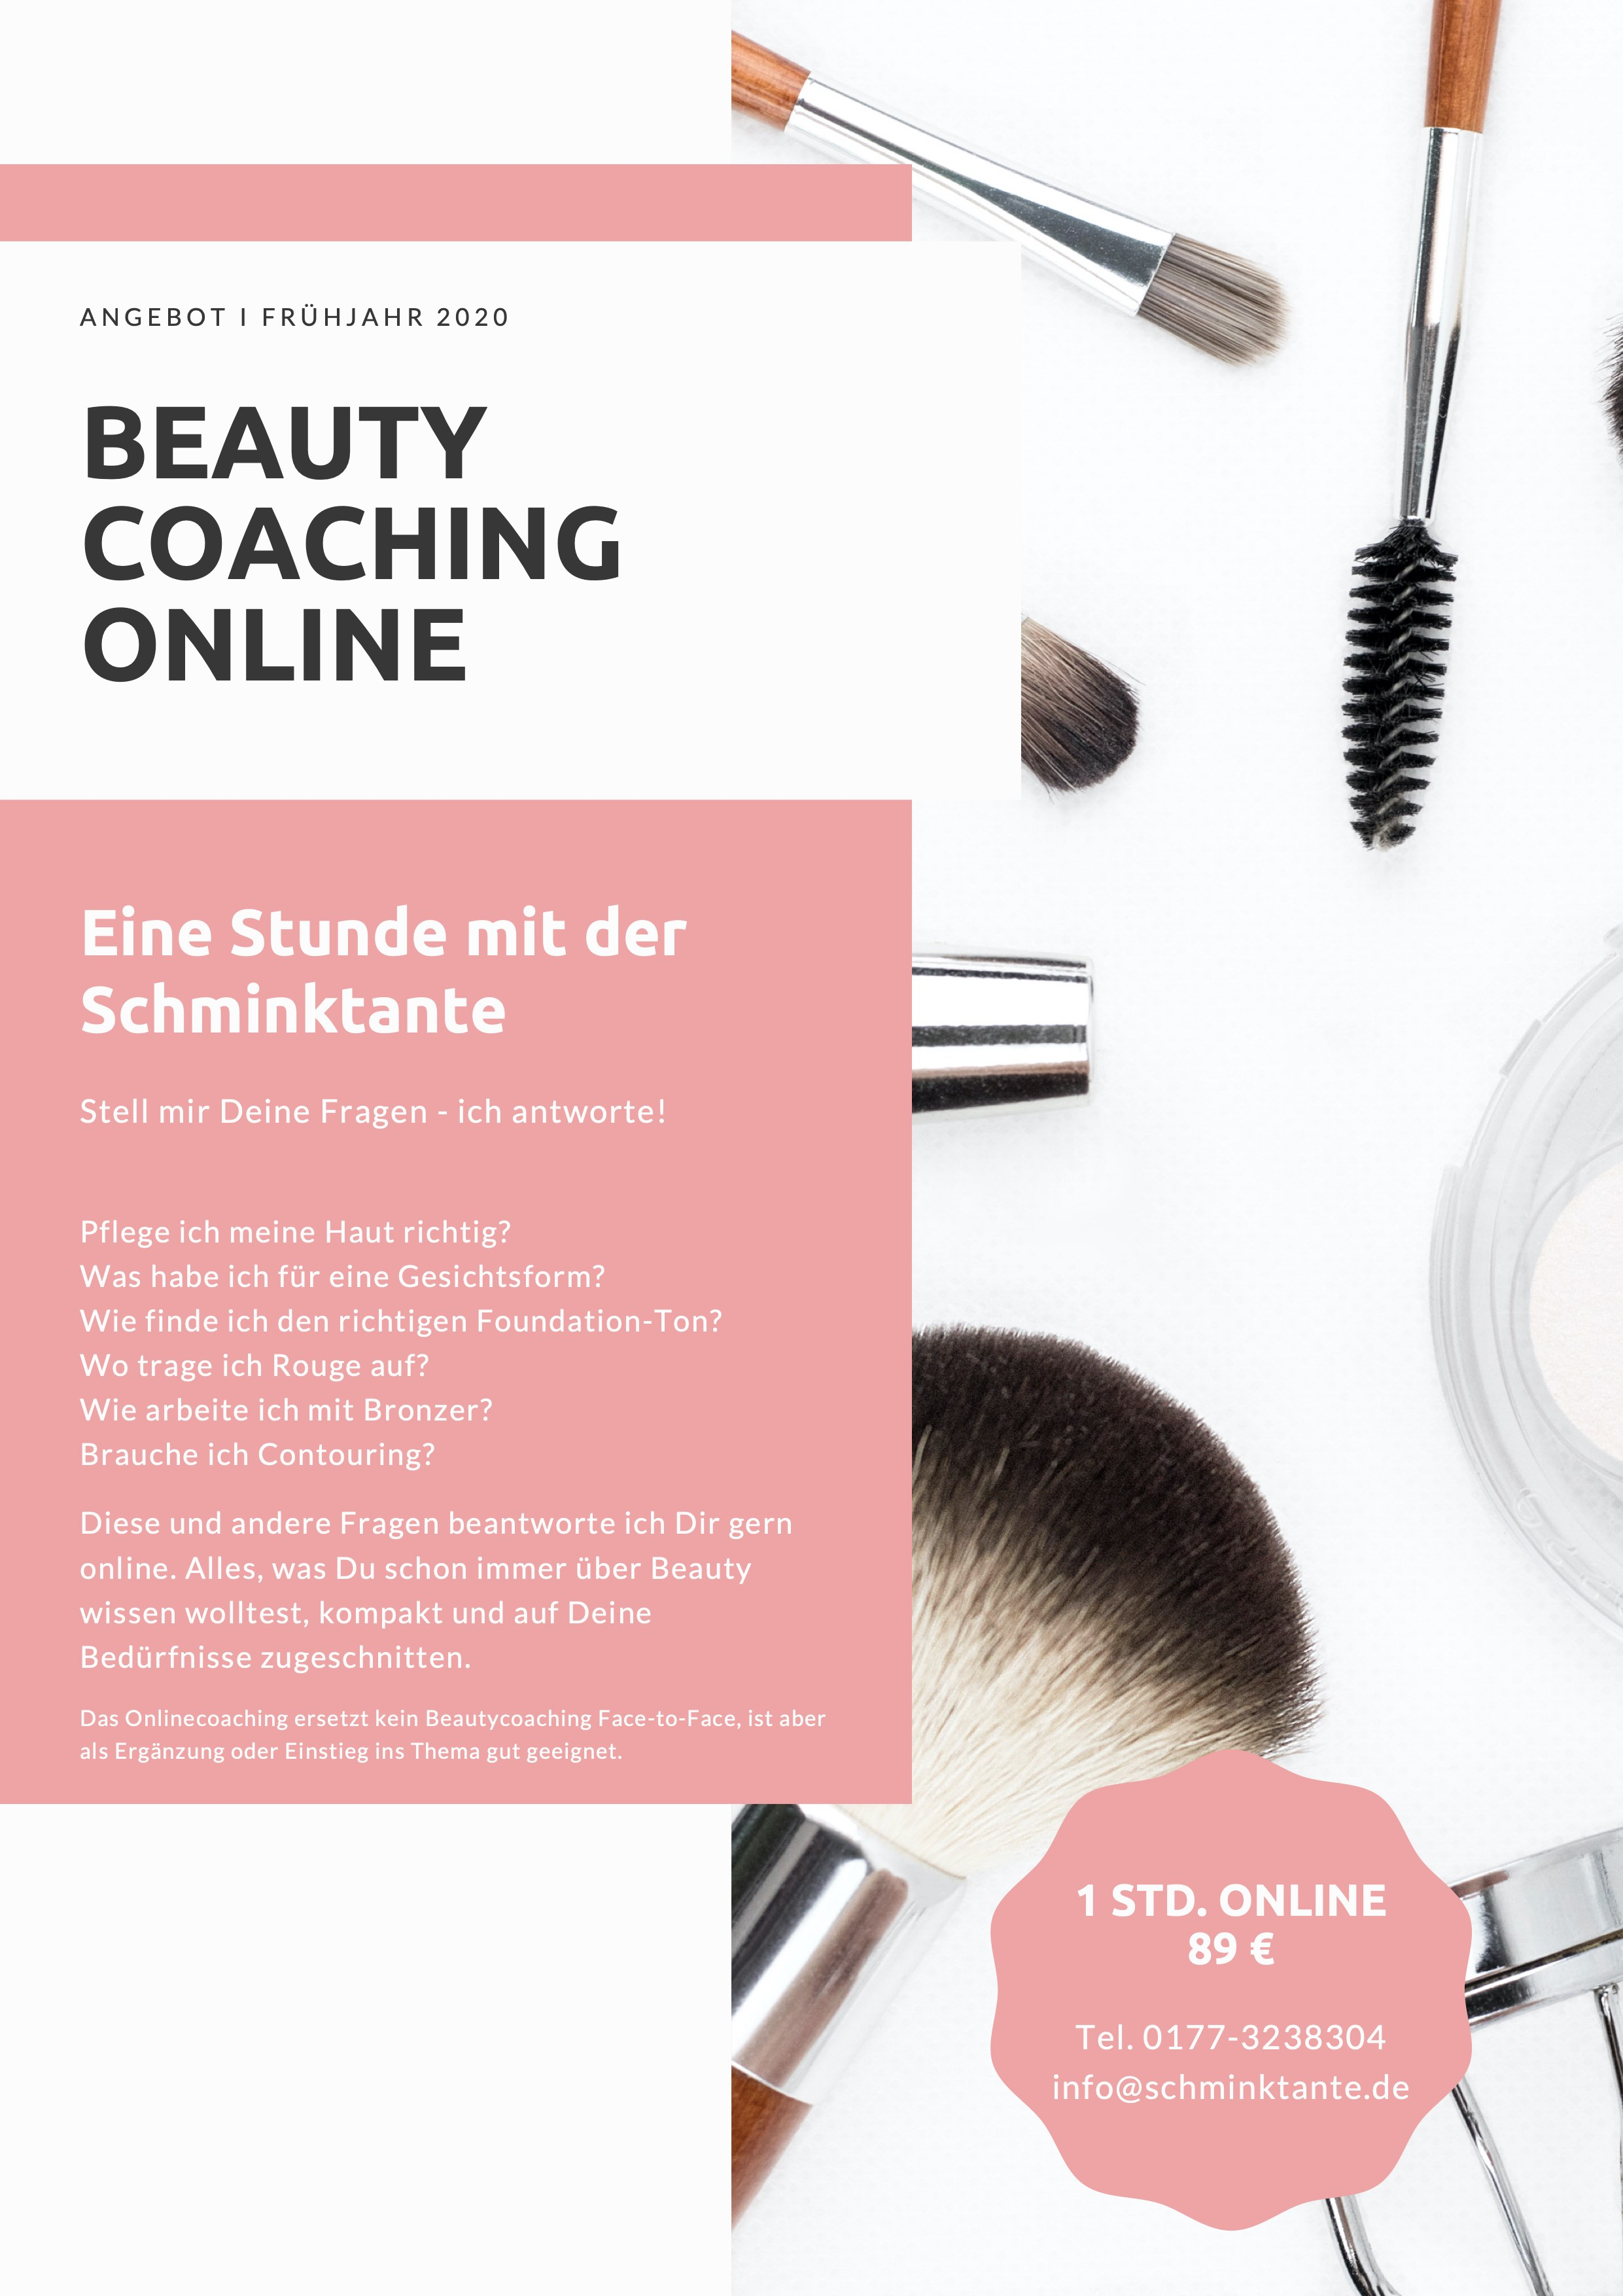 Beautycoaching, Coaching, Schminktipps, Online, Onlinecoaching, Schminktante, Anja Frankenhäuser